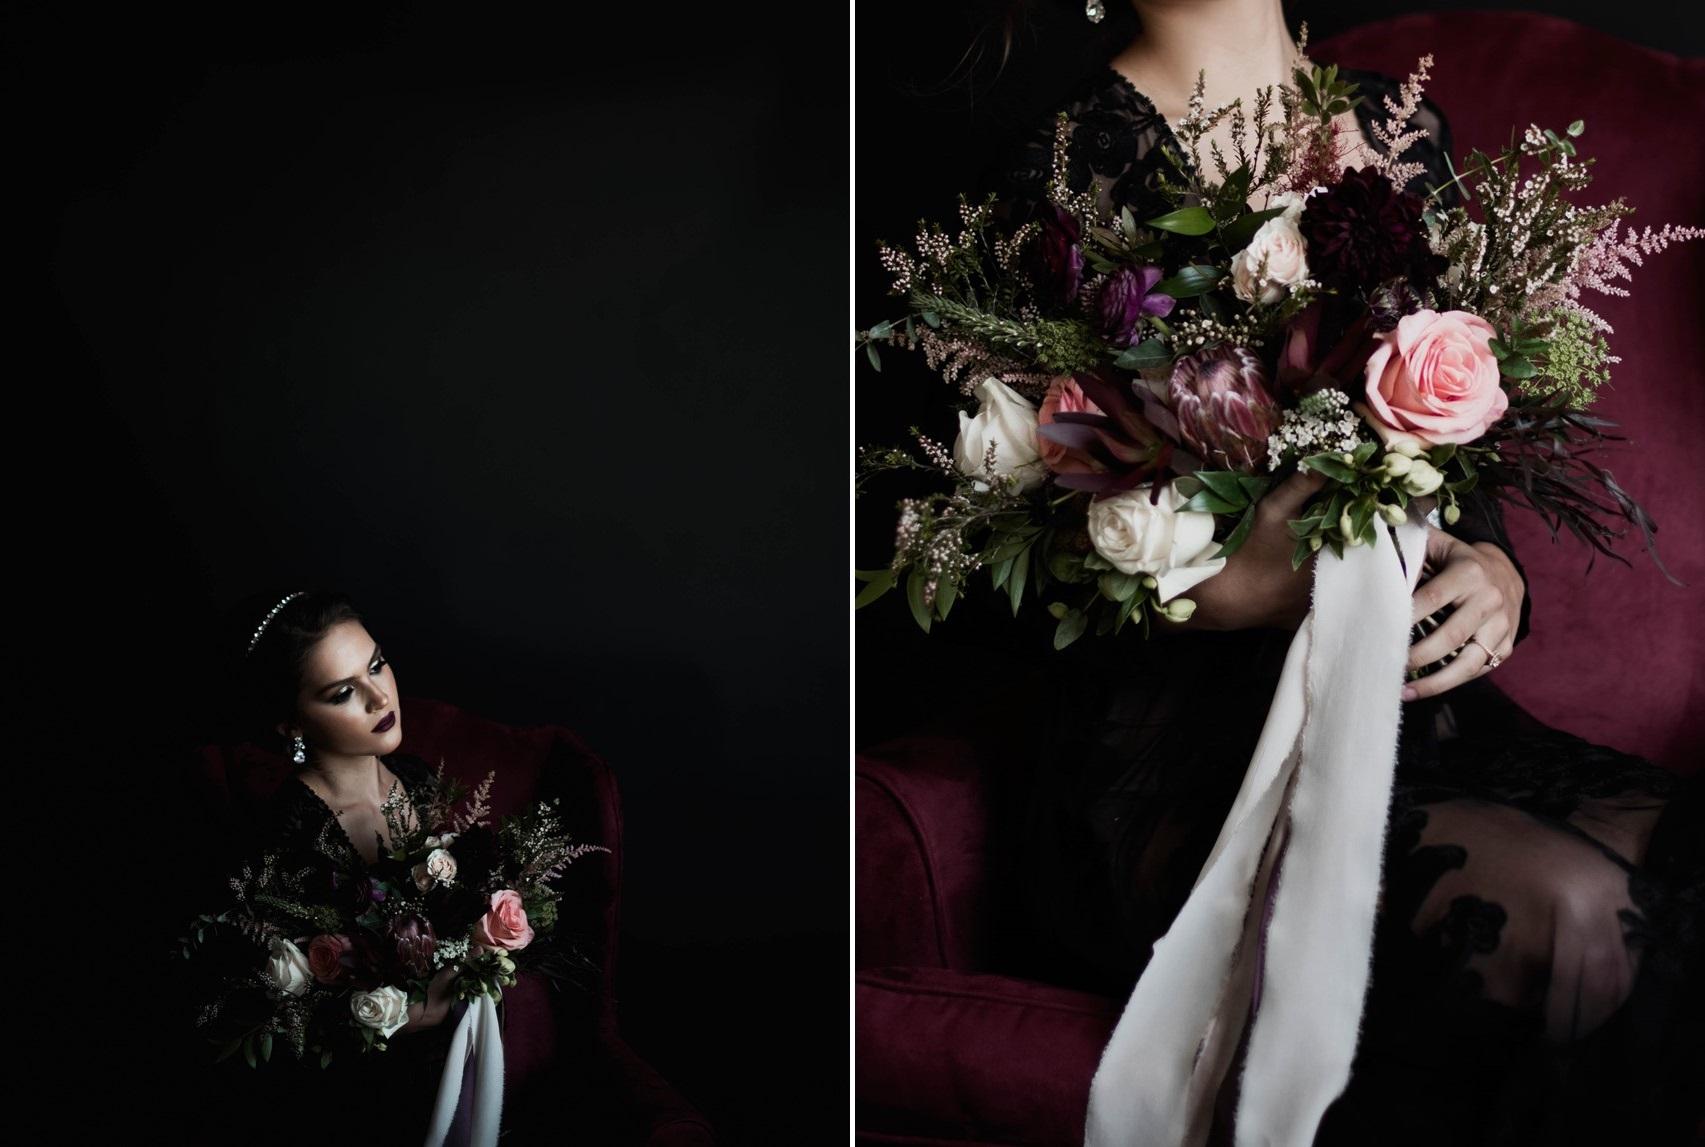 Dark & Moody Bride with Red Bridal Bouquet